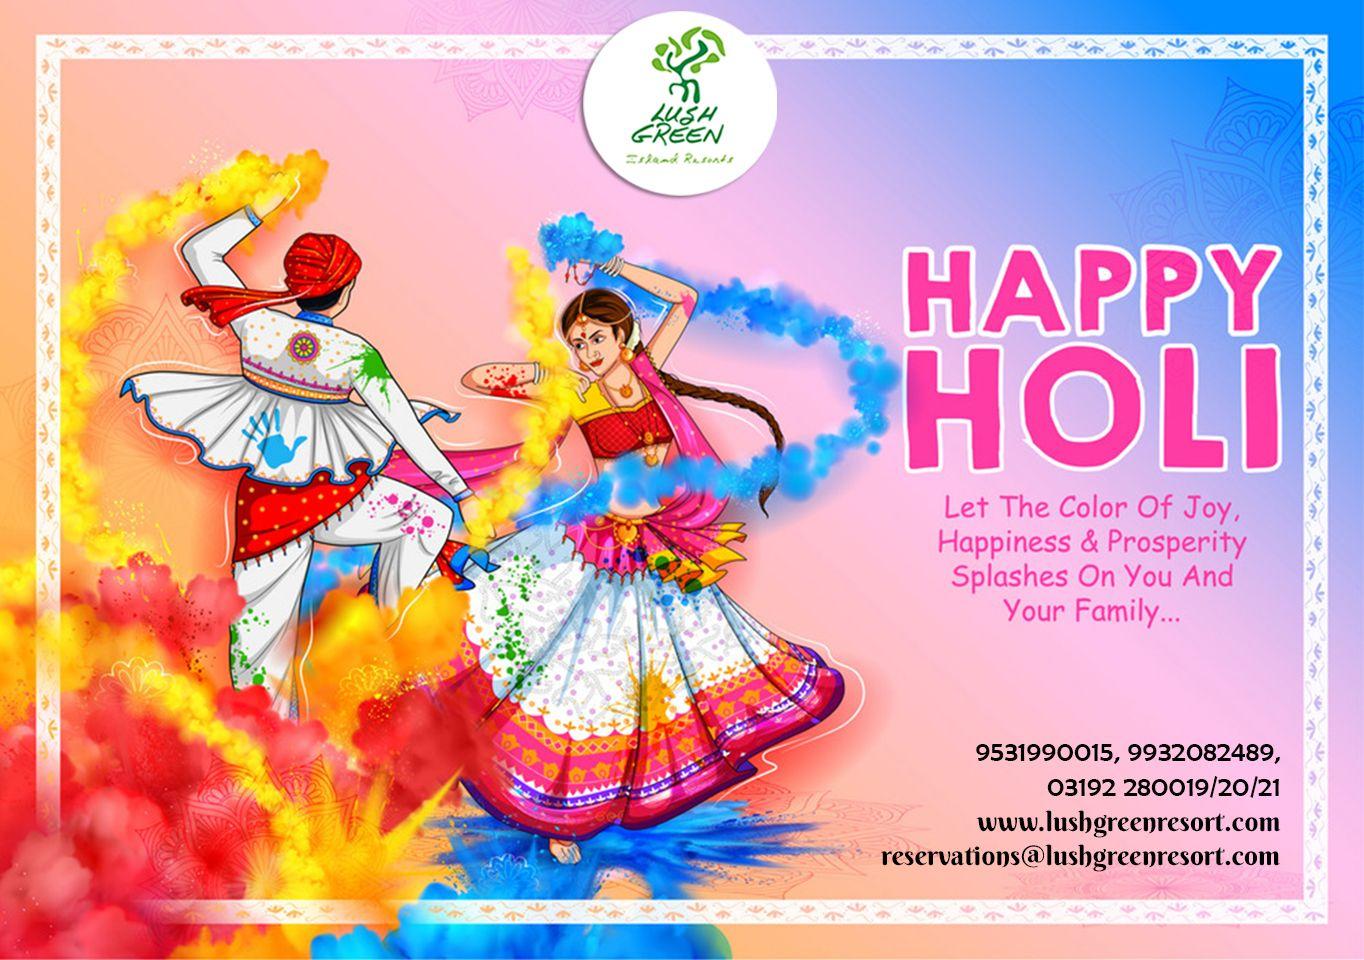 #Lush #Green #Resort, wishing you a very Happy Holi.  #holi #happyholi #india #festival #holifestival #love #colors #colours #color #holipowder #like #festivalofcolors #holifestivalofcolours #holihai #festivalofcolours #holifest #indianfestival #HappyHoli2020